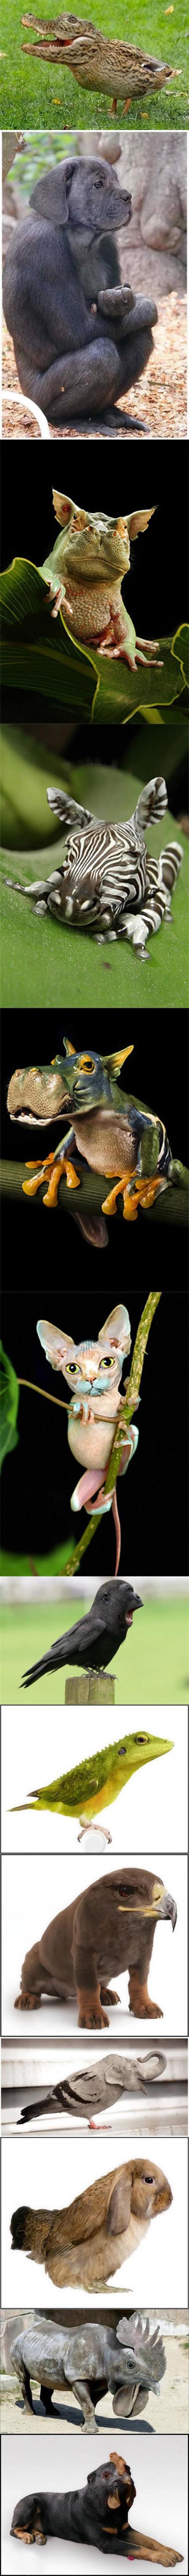 Animal Photoshop Hybrids